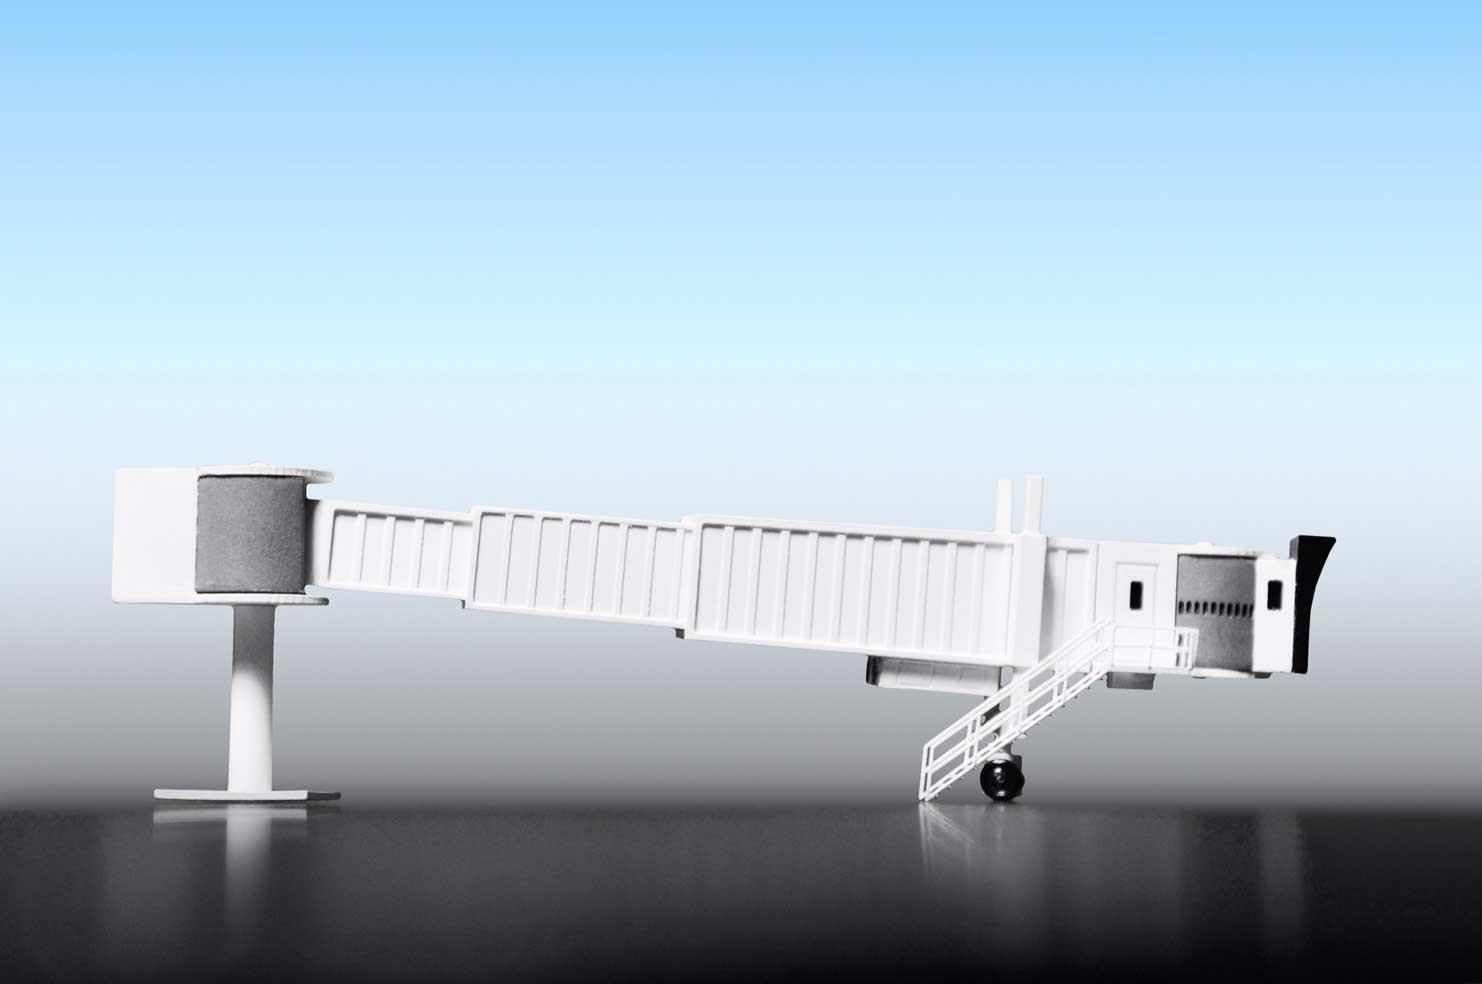 Fluggastbrücke Frabe weiss